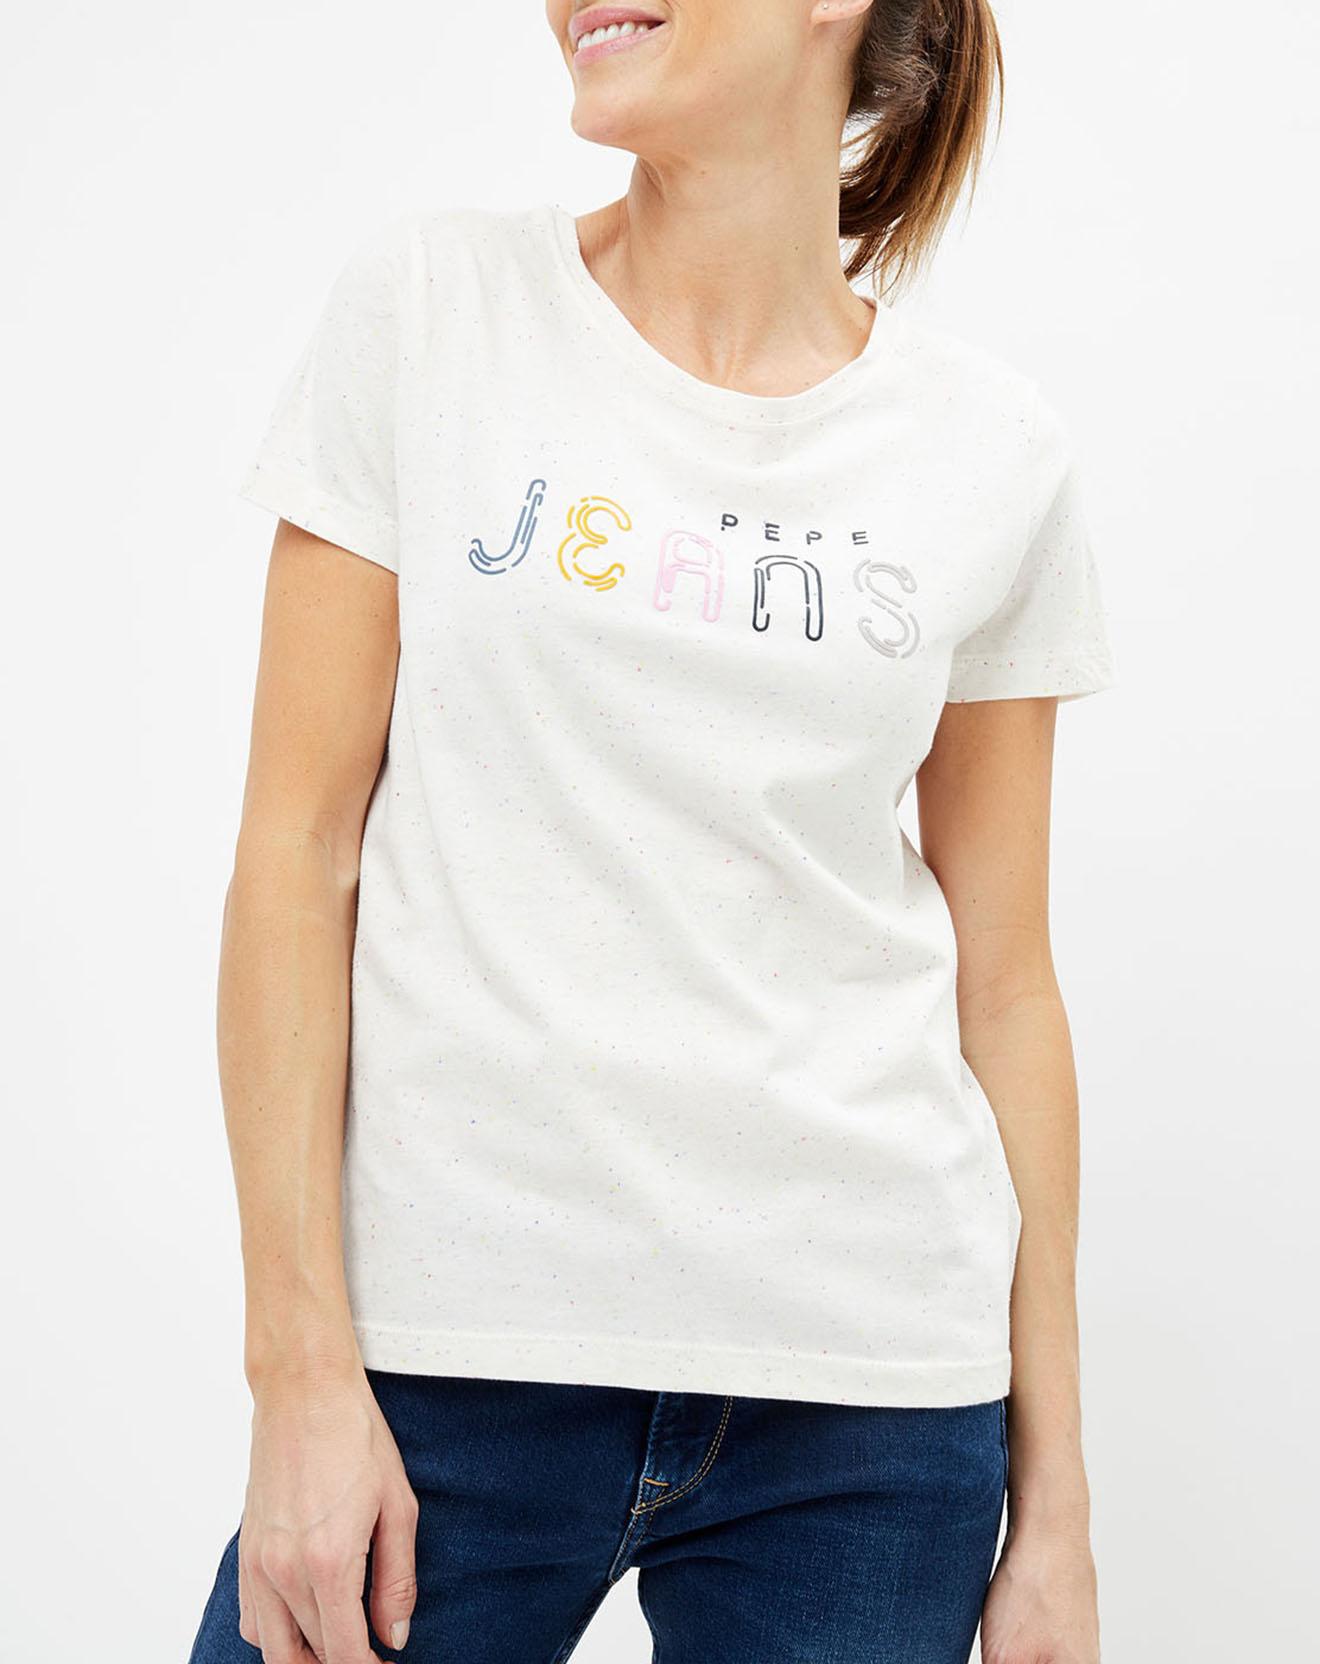 T-Shirt Dallas à motif blanc - Pepe Jeans - Modalova